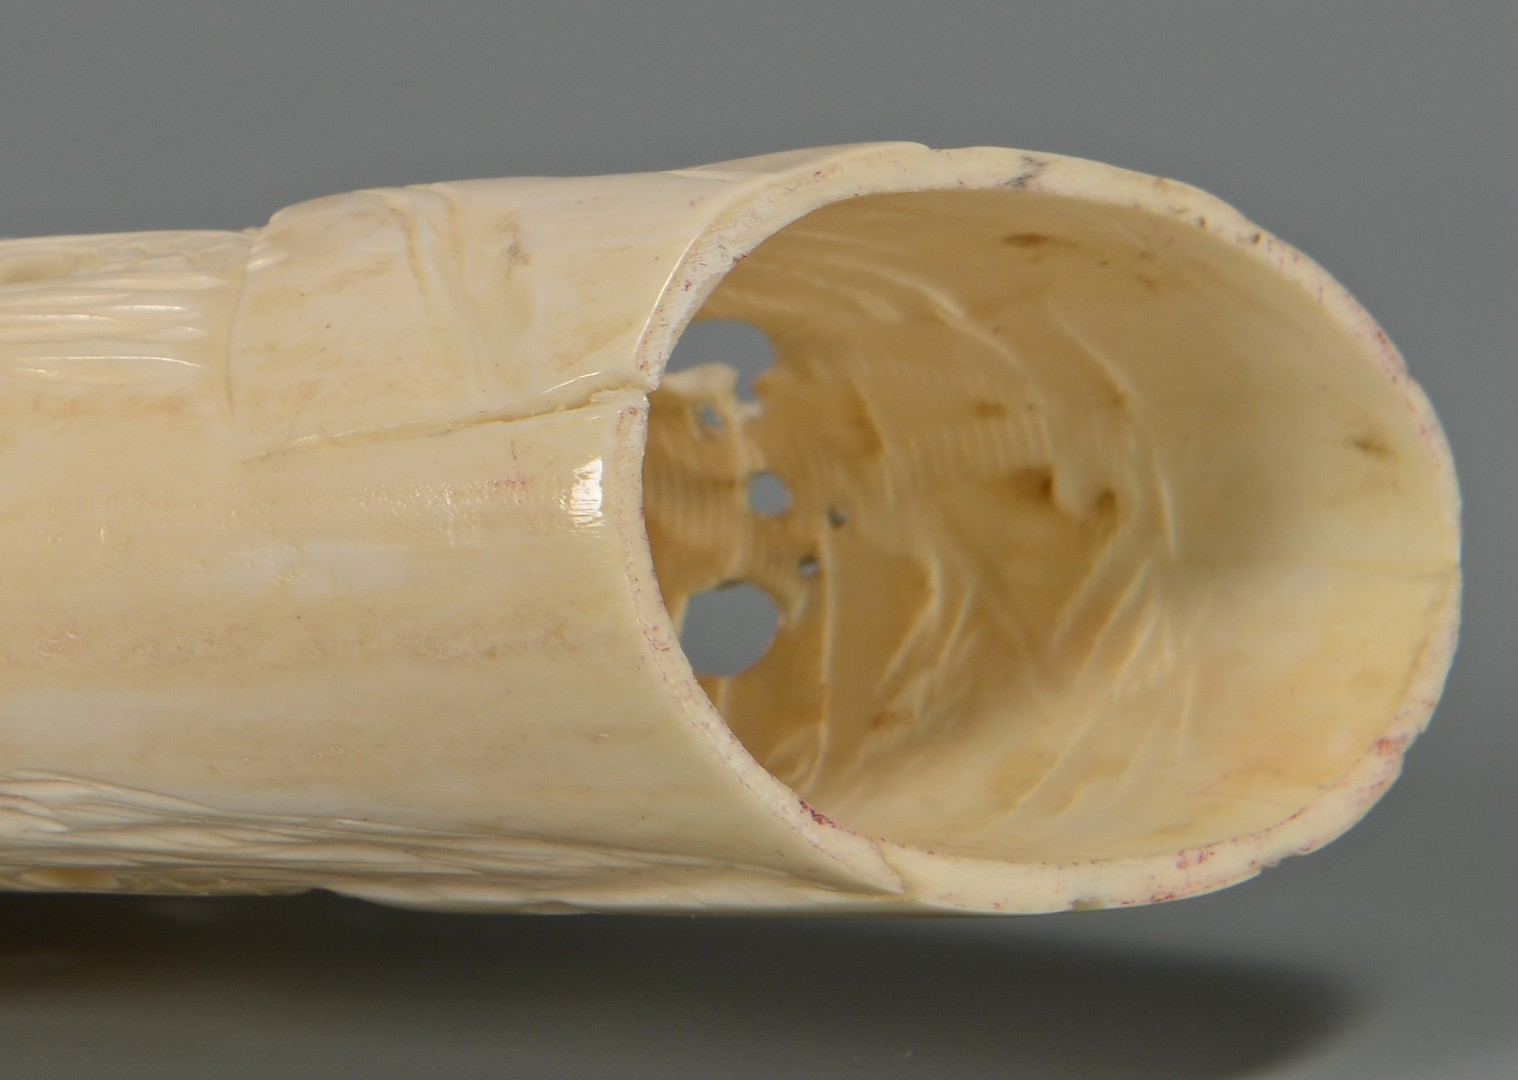 Lot 374: Chinese Carved Ivory Tusk, Openwork Bridge